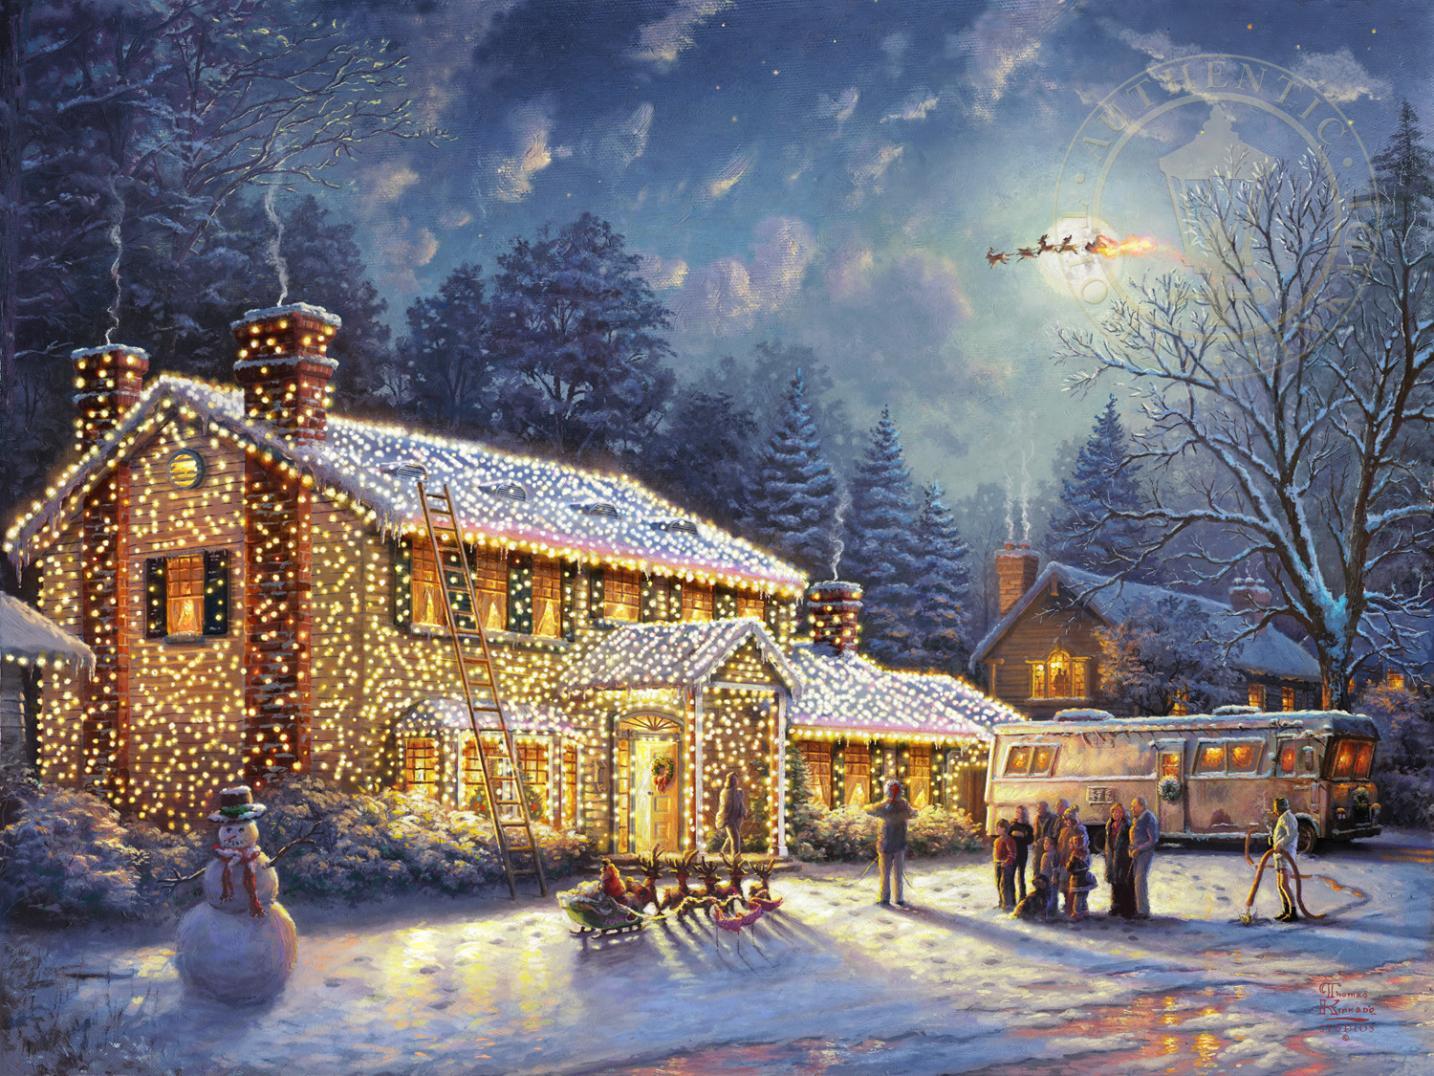 Thomas Kinkade Studios National Lampoon's Christmas Vacation Limited Edition Canvas Artwork